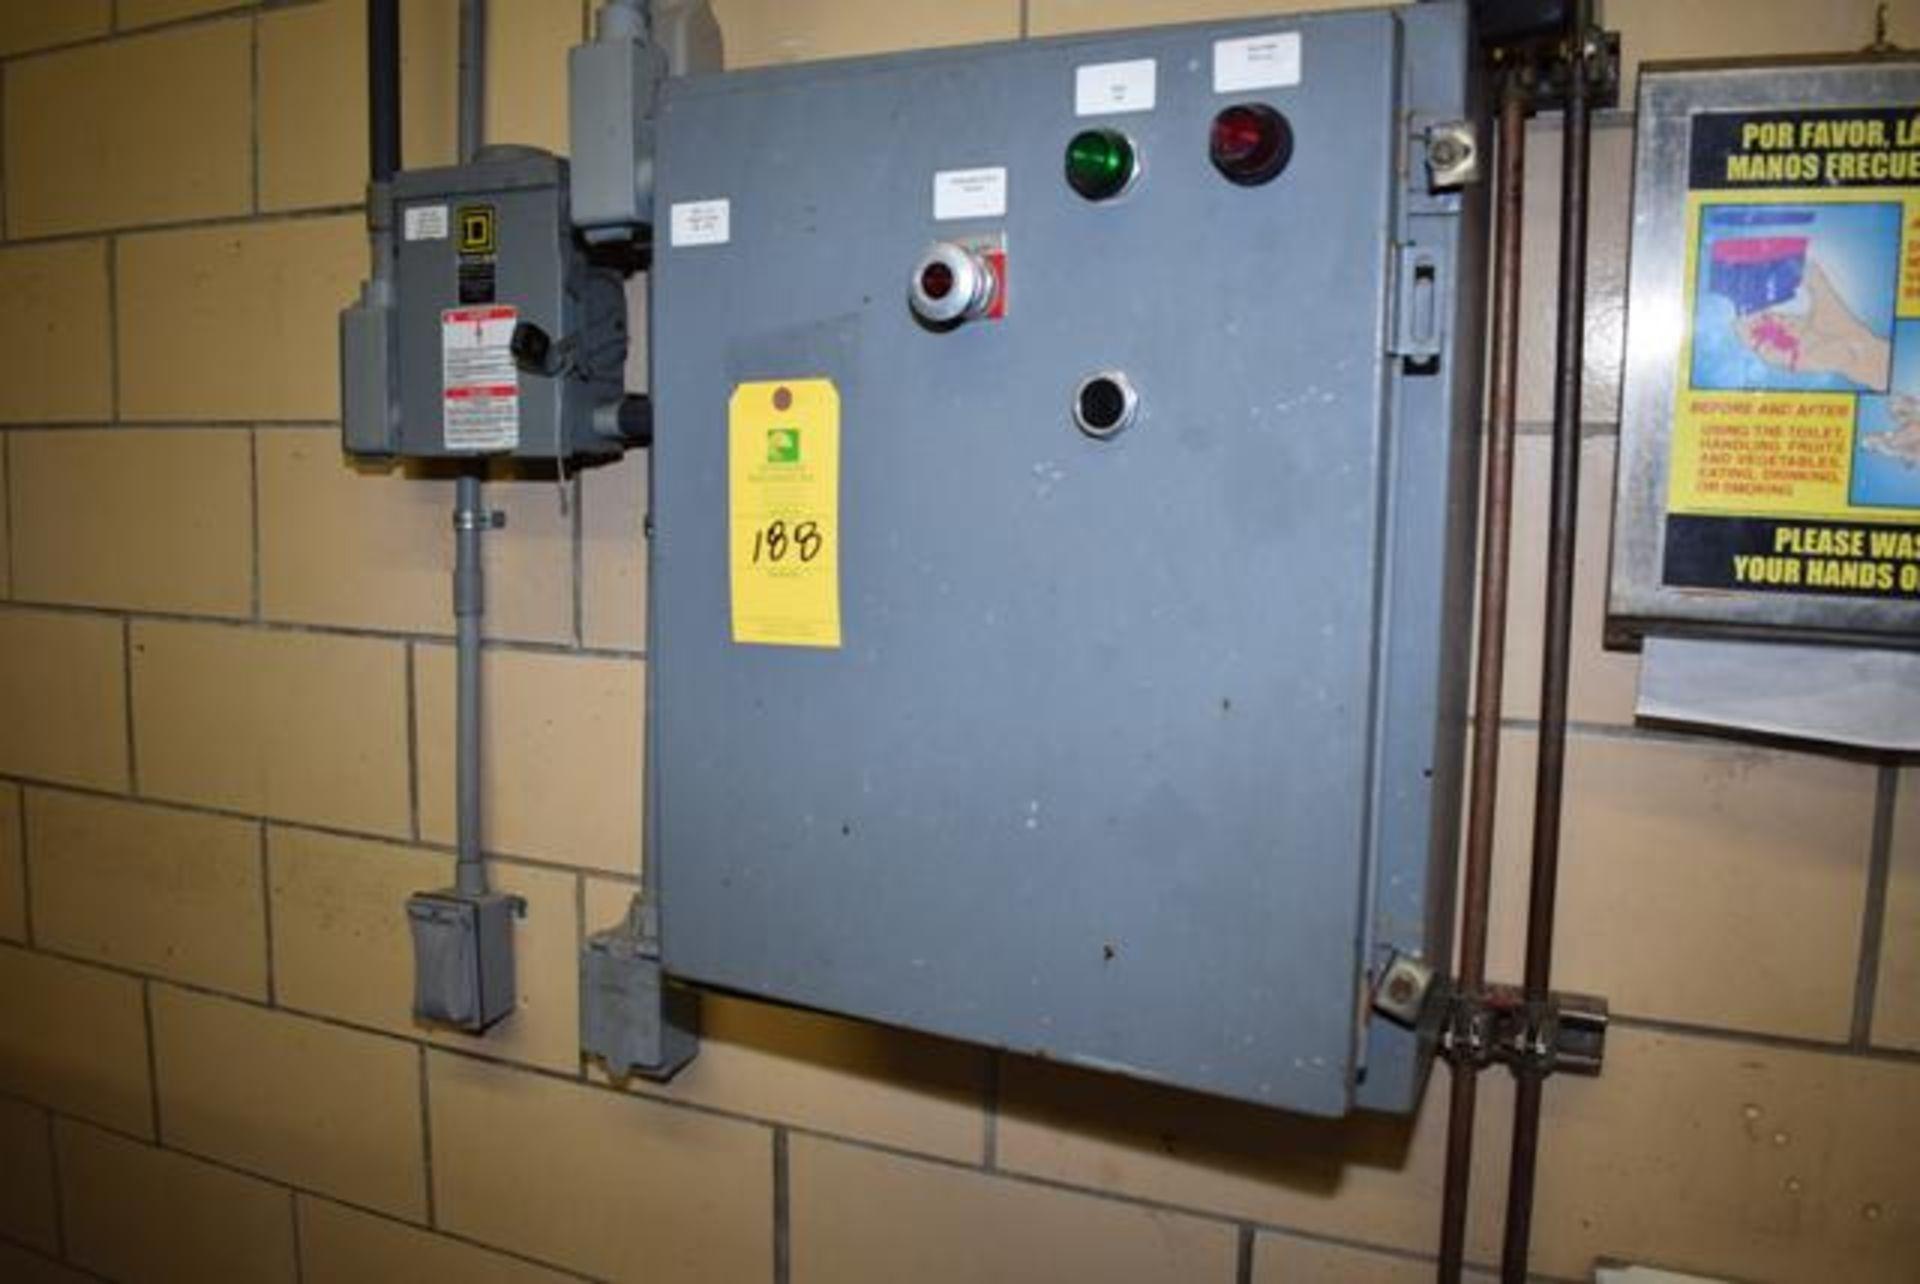 Lot 188 - Homogenizer Control Panel with Allen Bradley PLC Single Door Panel Box, Loading Fee: $100